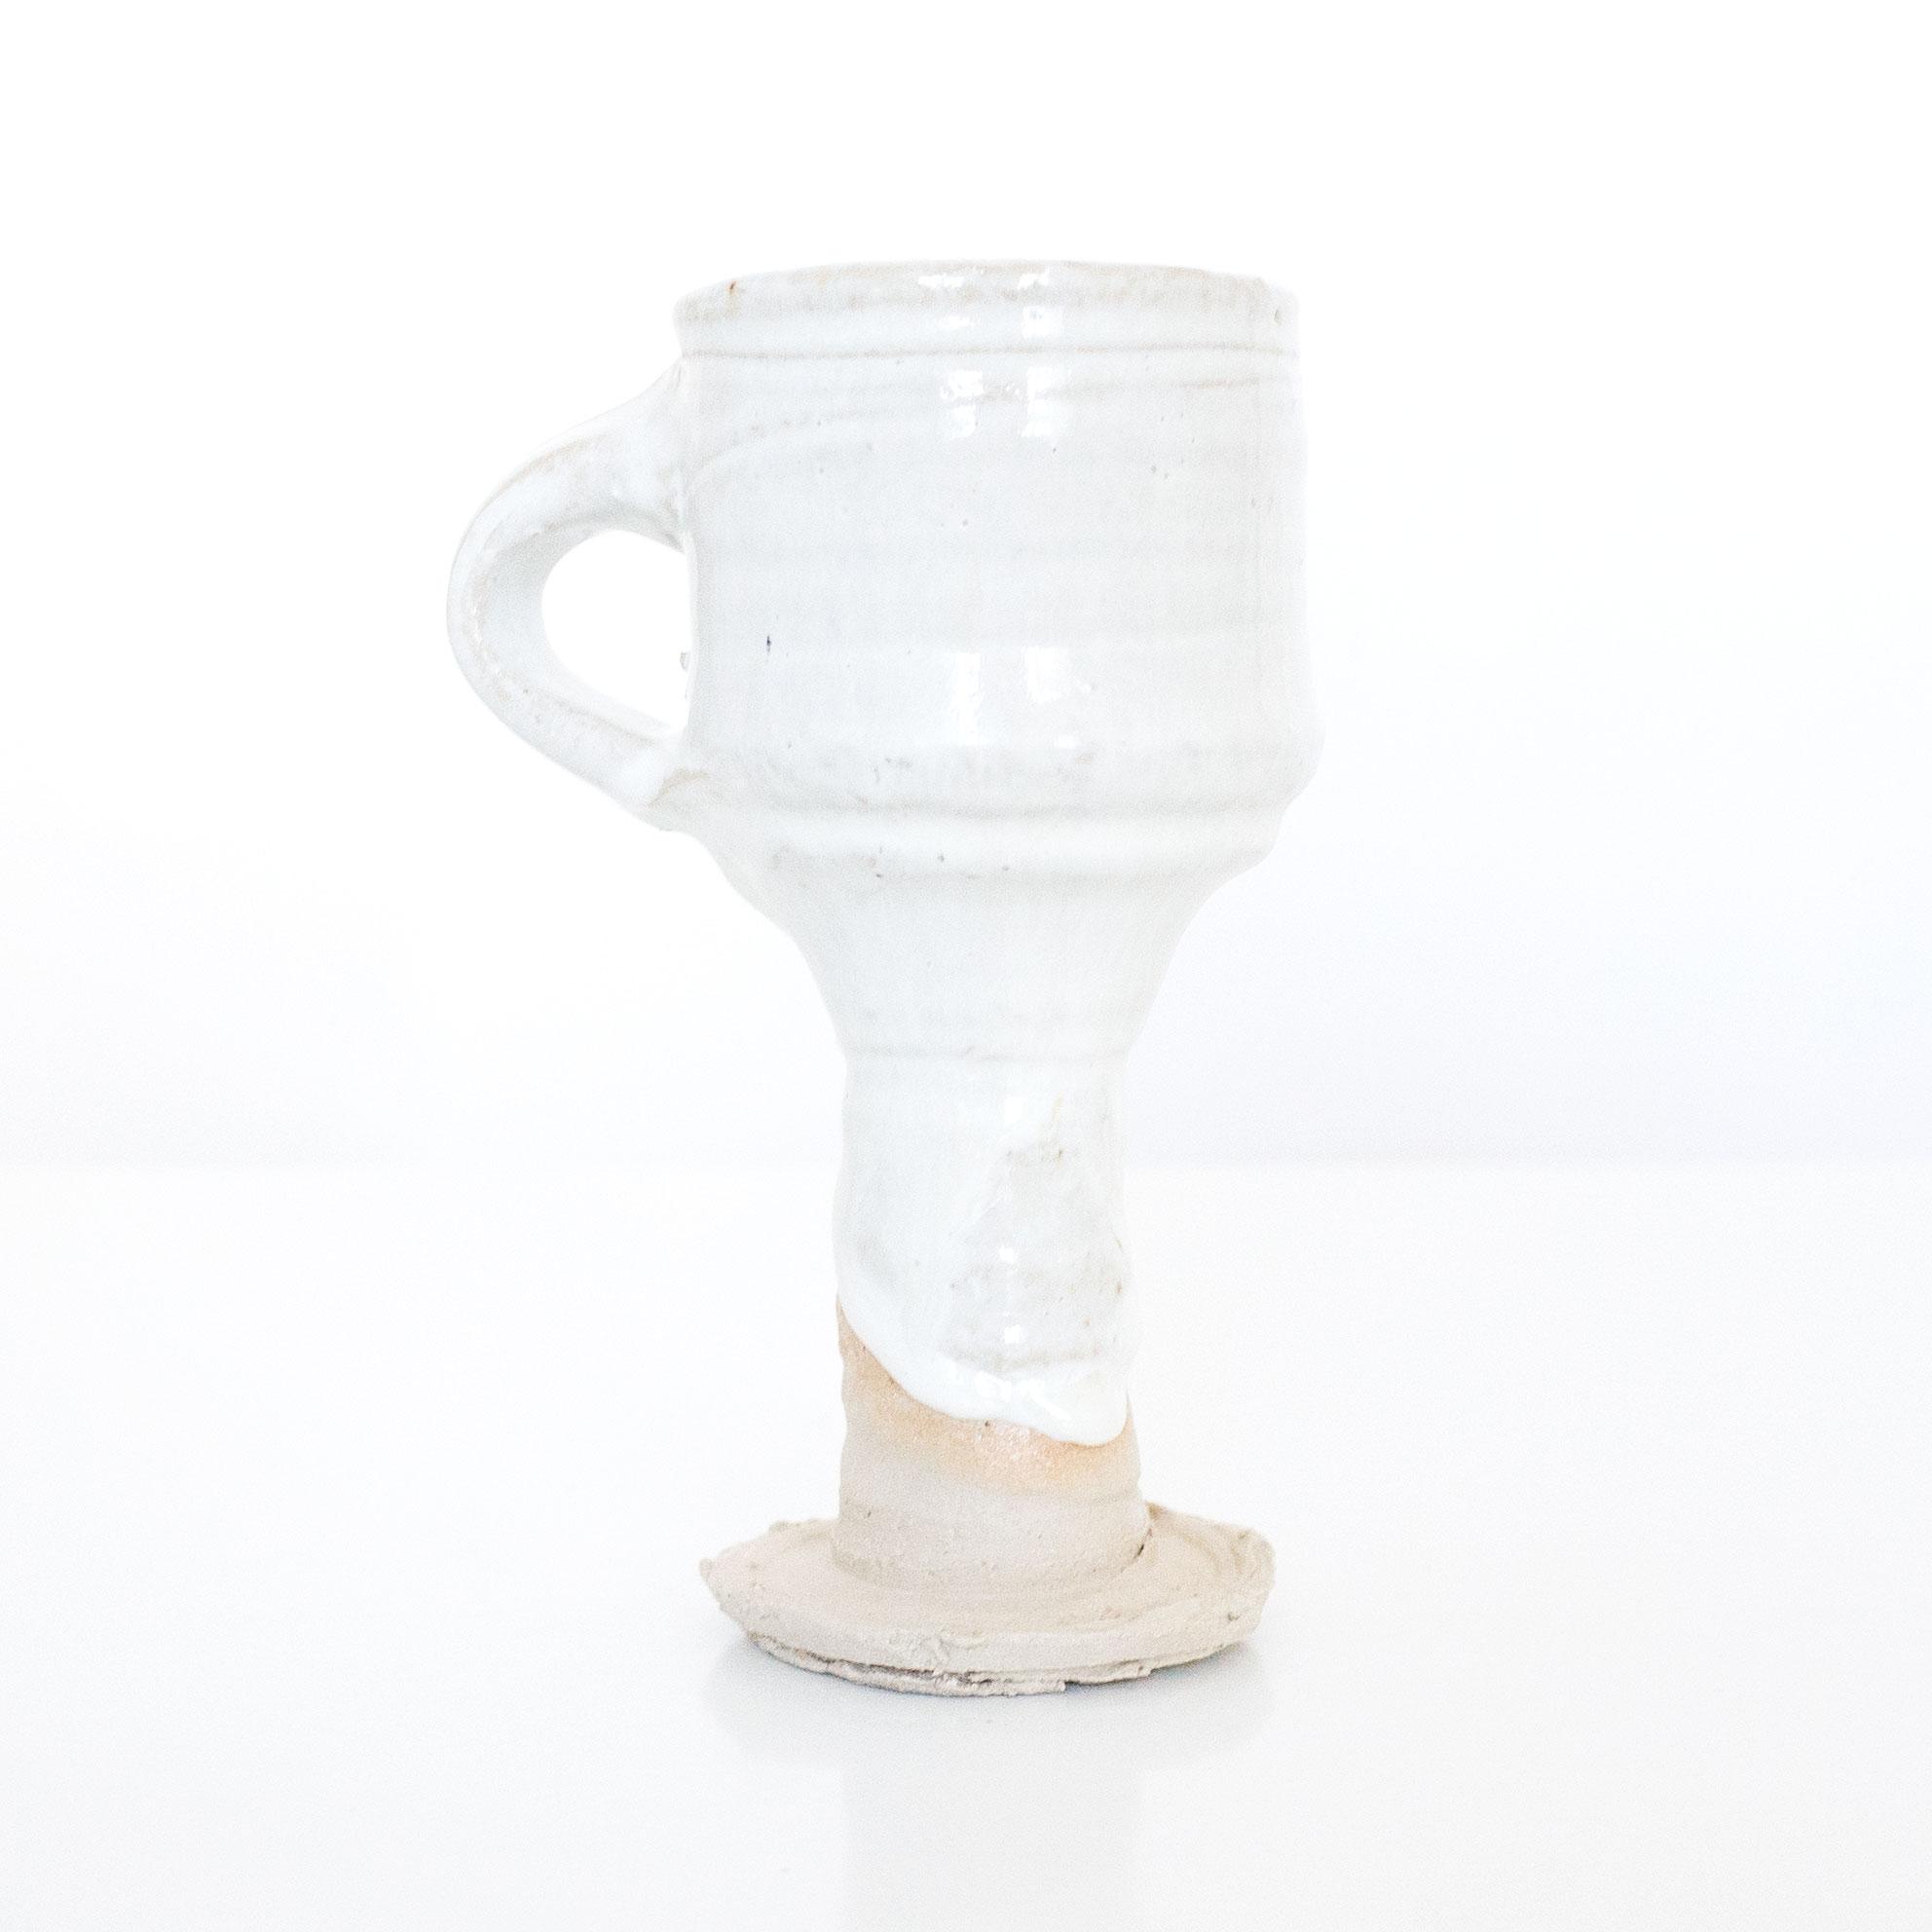 Erik Haugsby Pottery handmade ceramic chalice gobleat